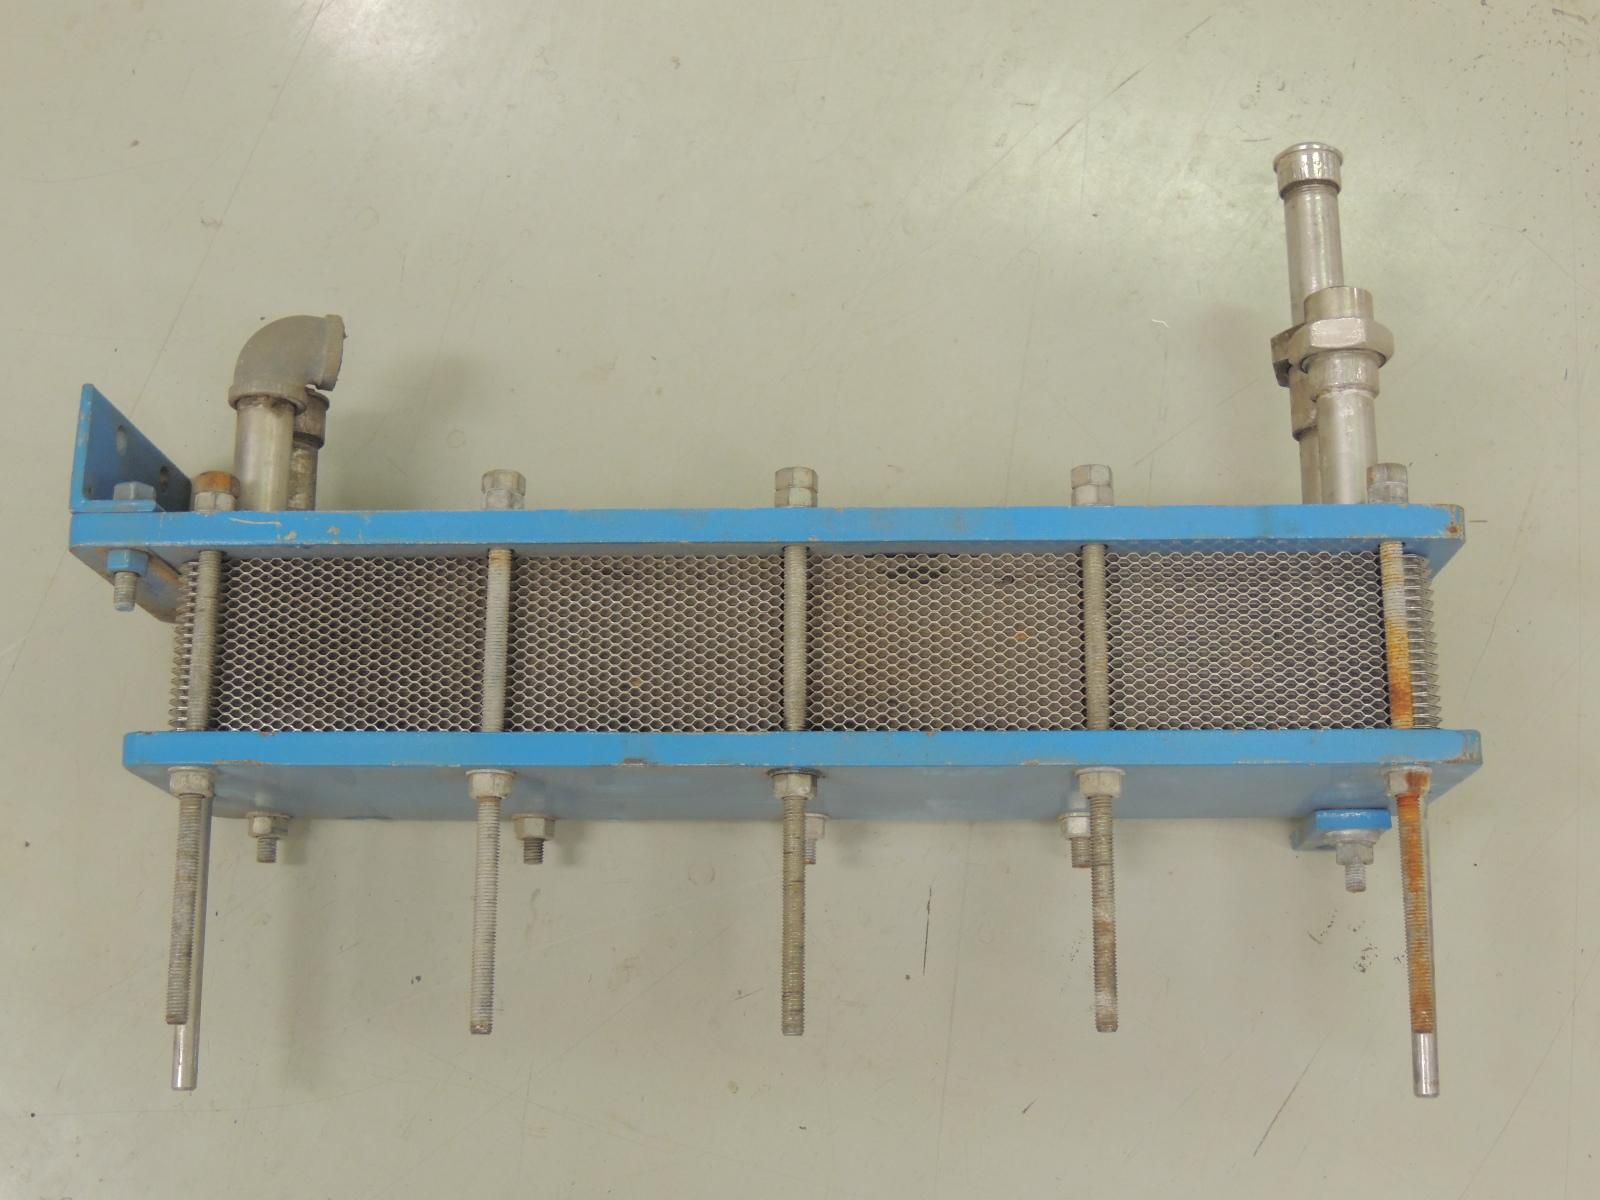 Electric Blanket Wiring Diagram Besides Electric Blanket Circuit